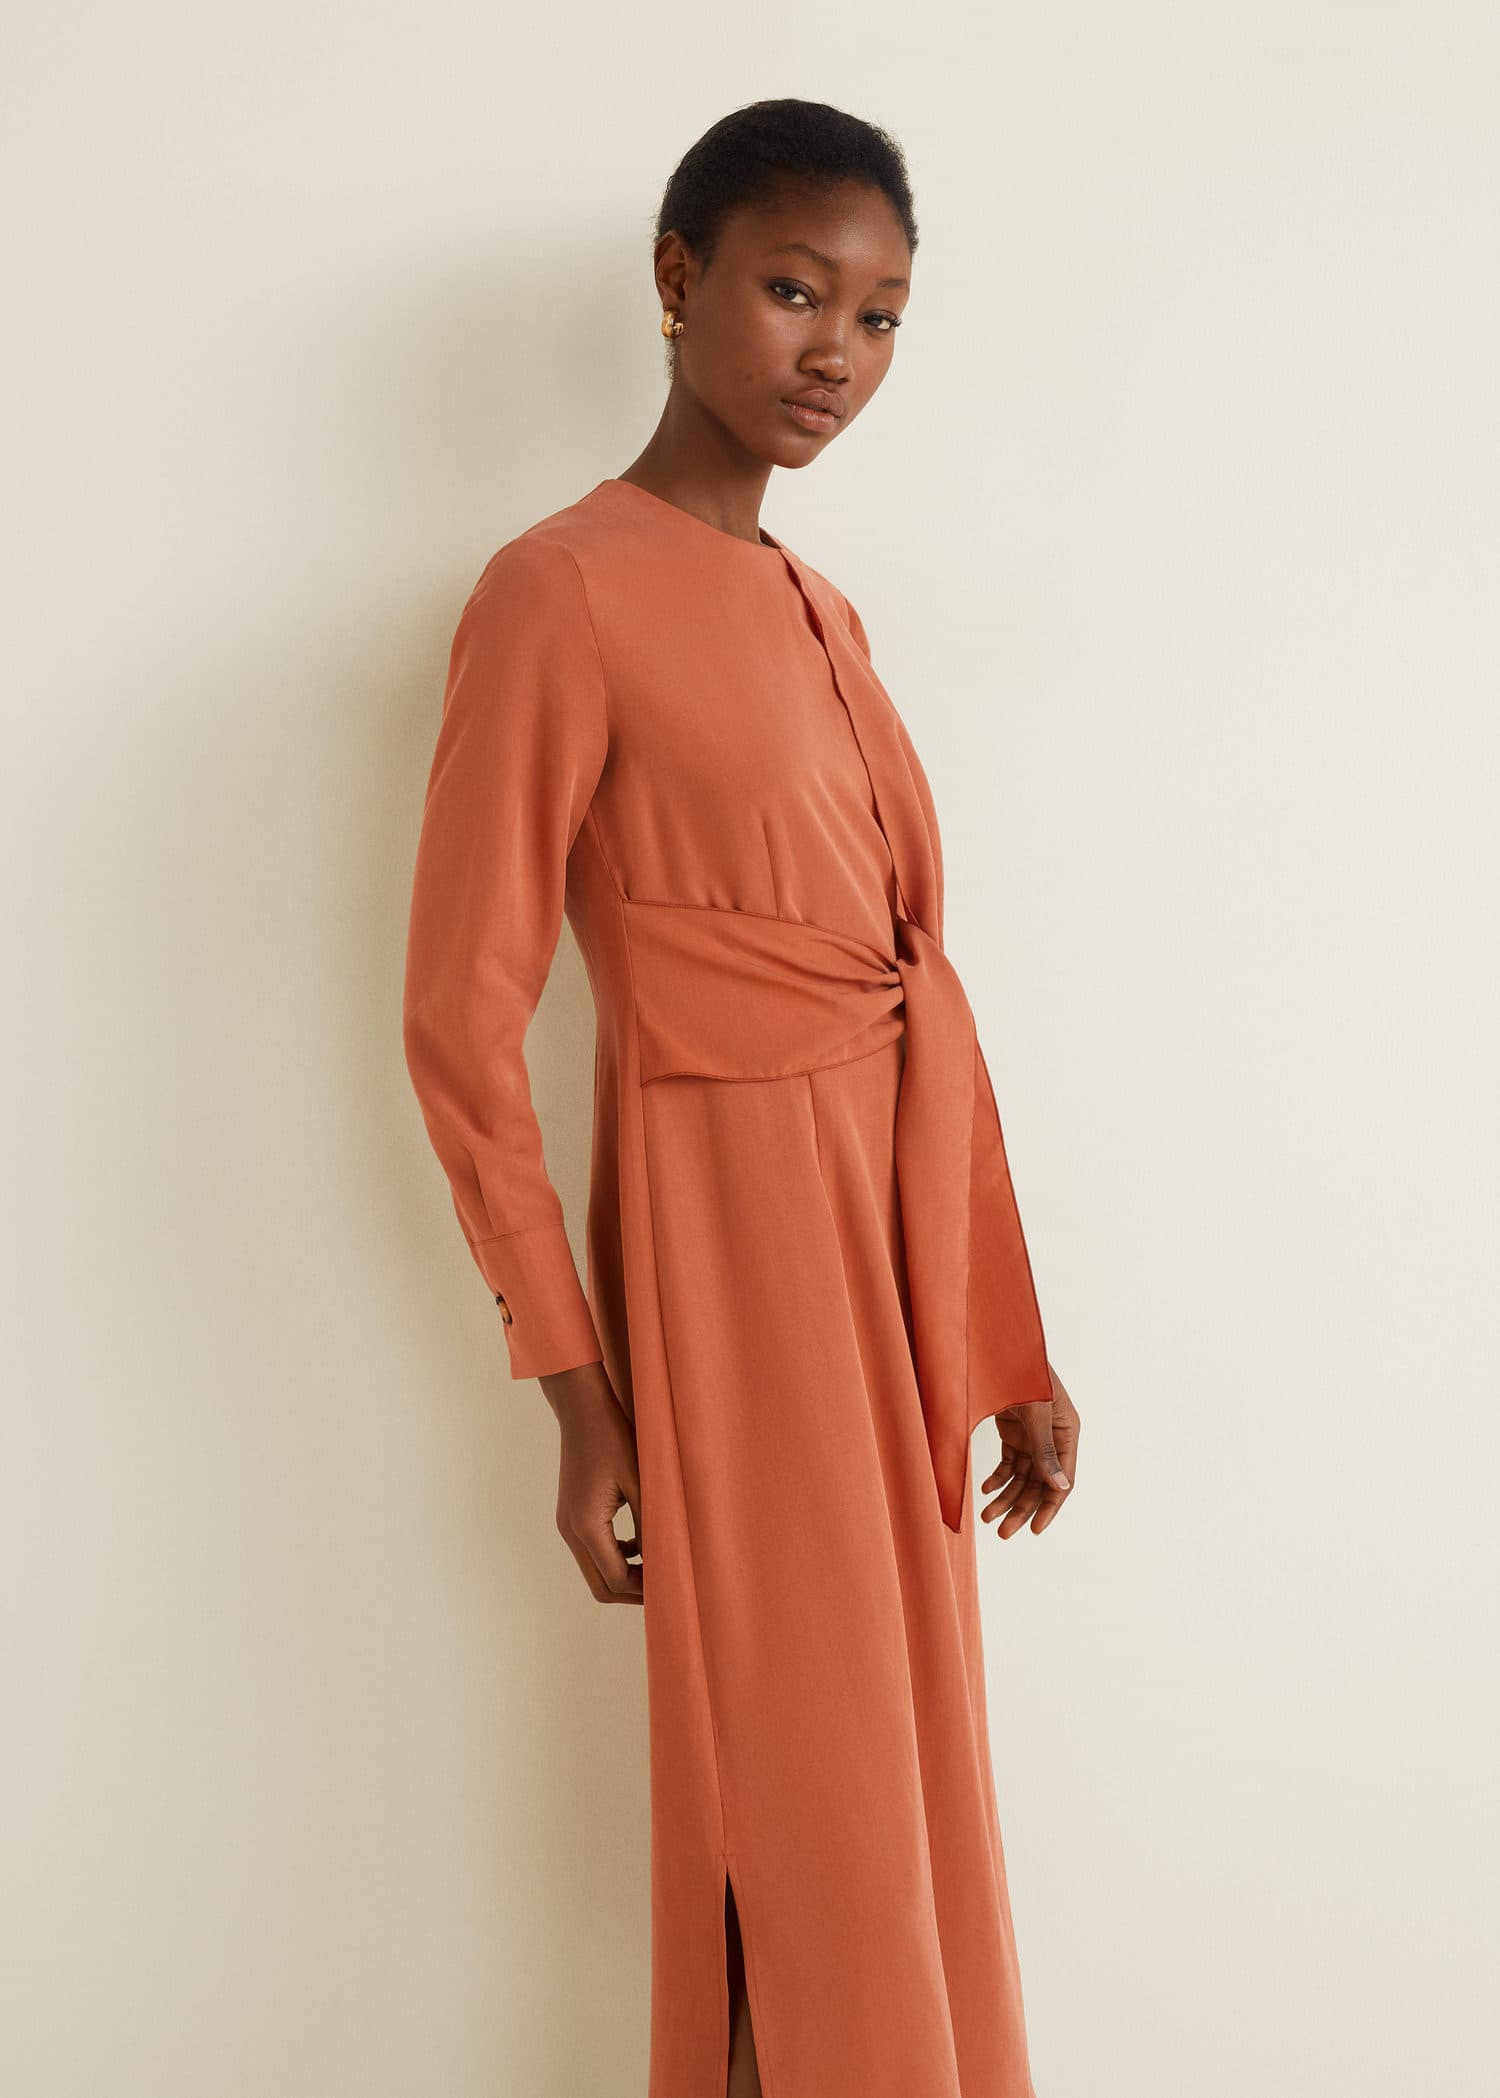 Ebay espana vestidos mujer